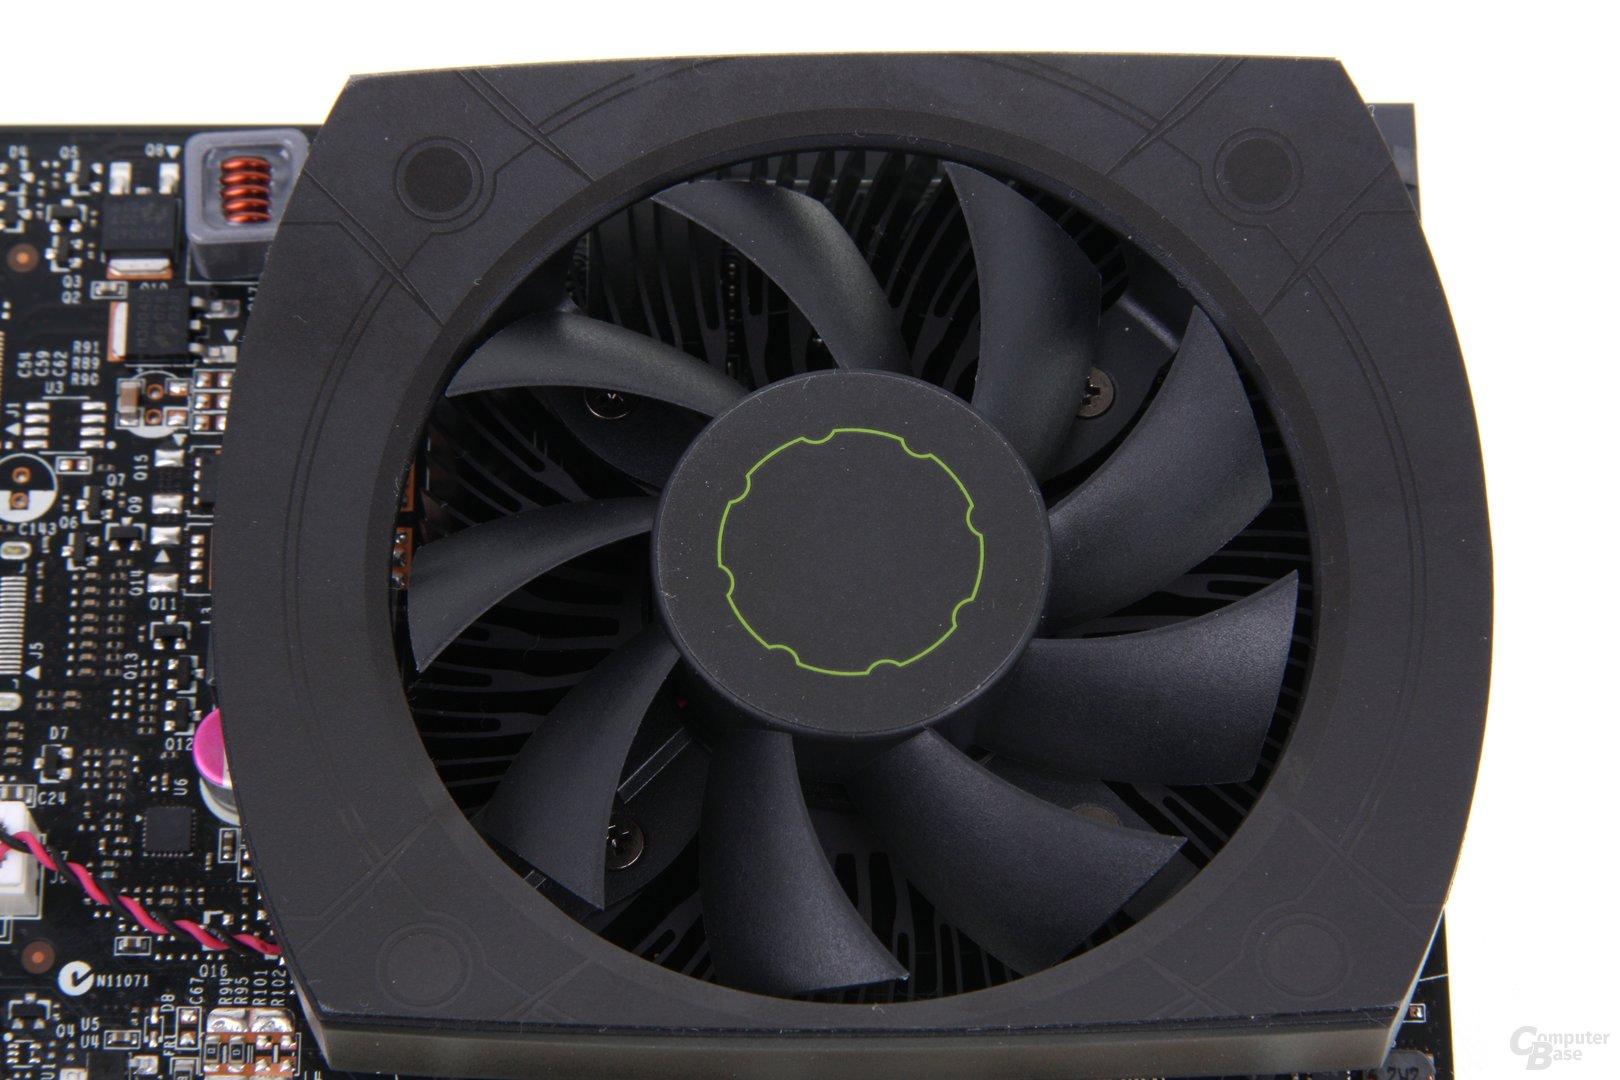 GeForce GTX 650 Ti Lüfter